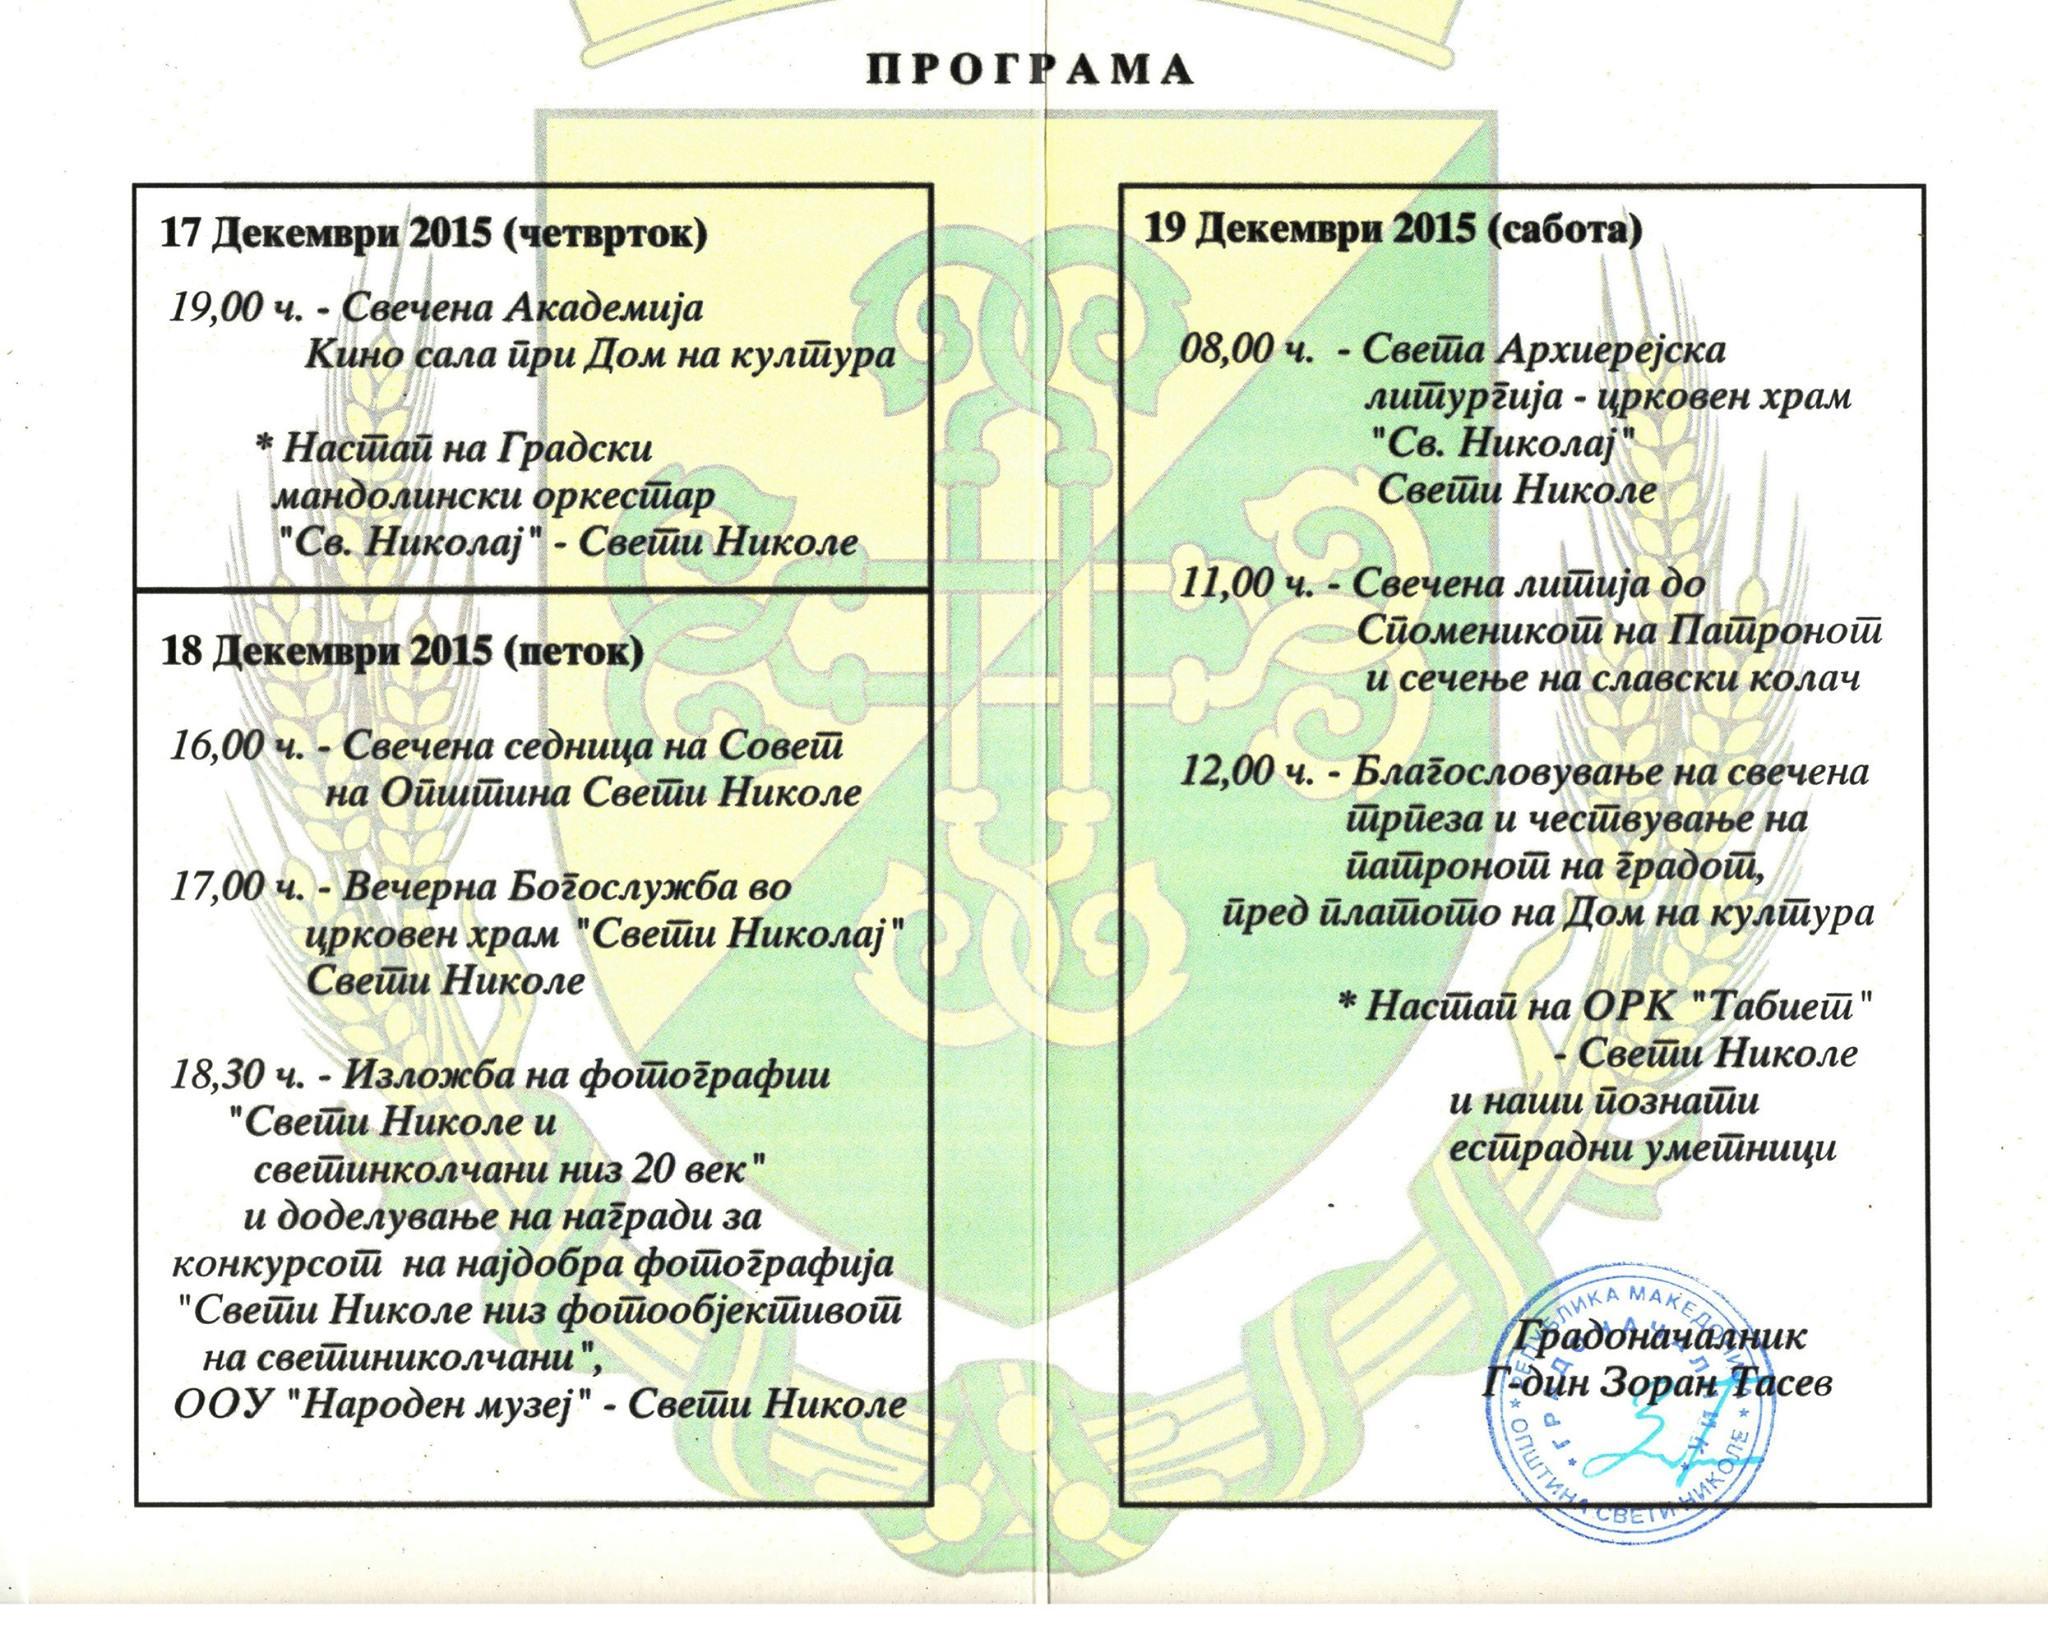 programa sveti nikolaj